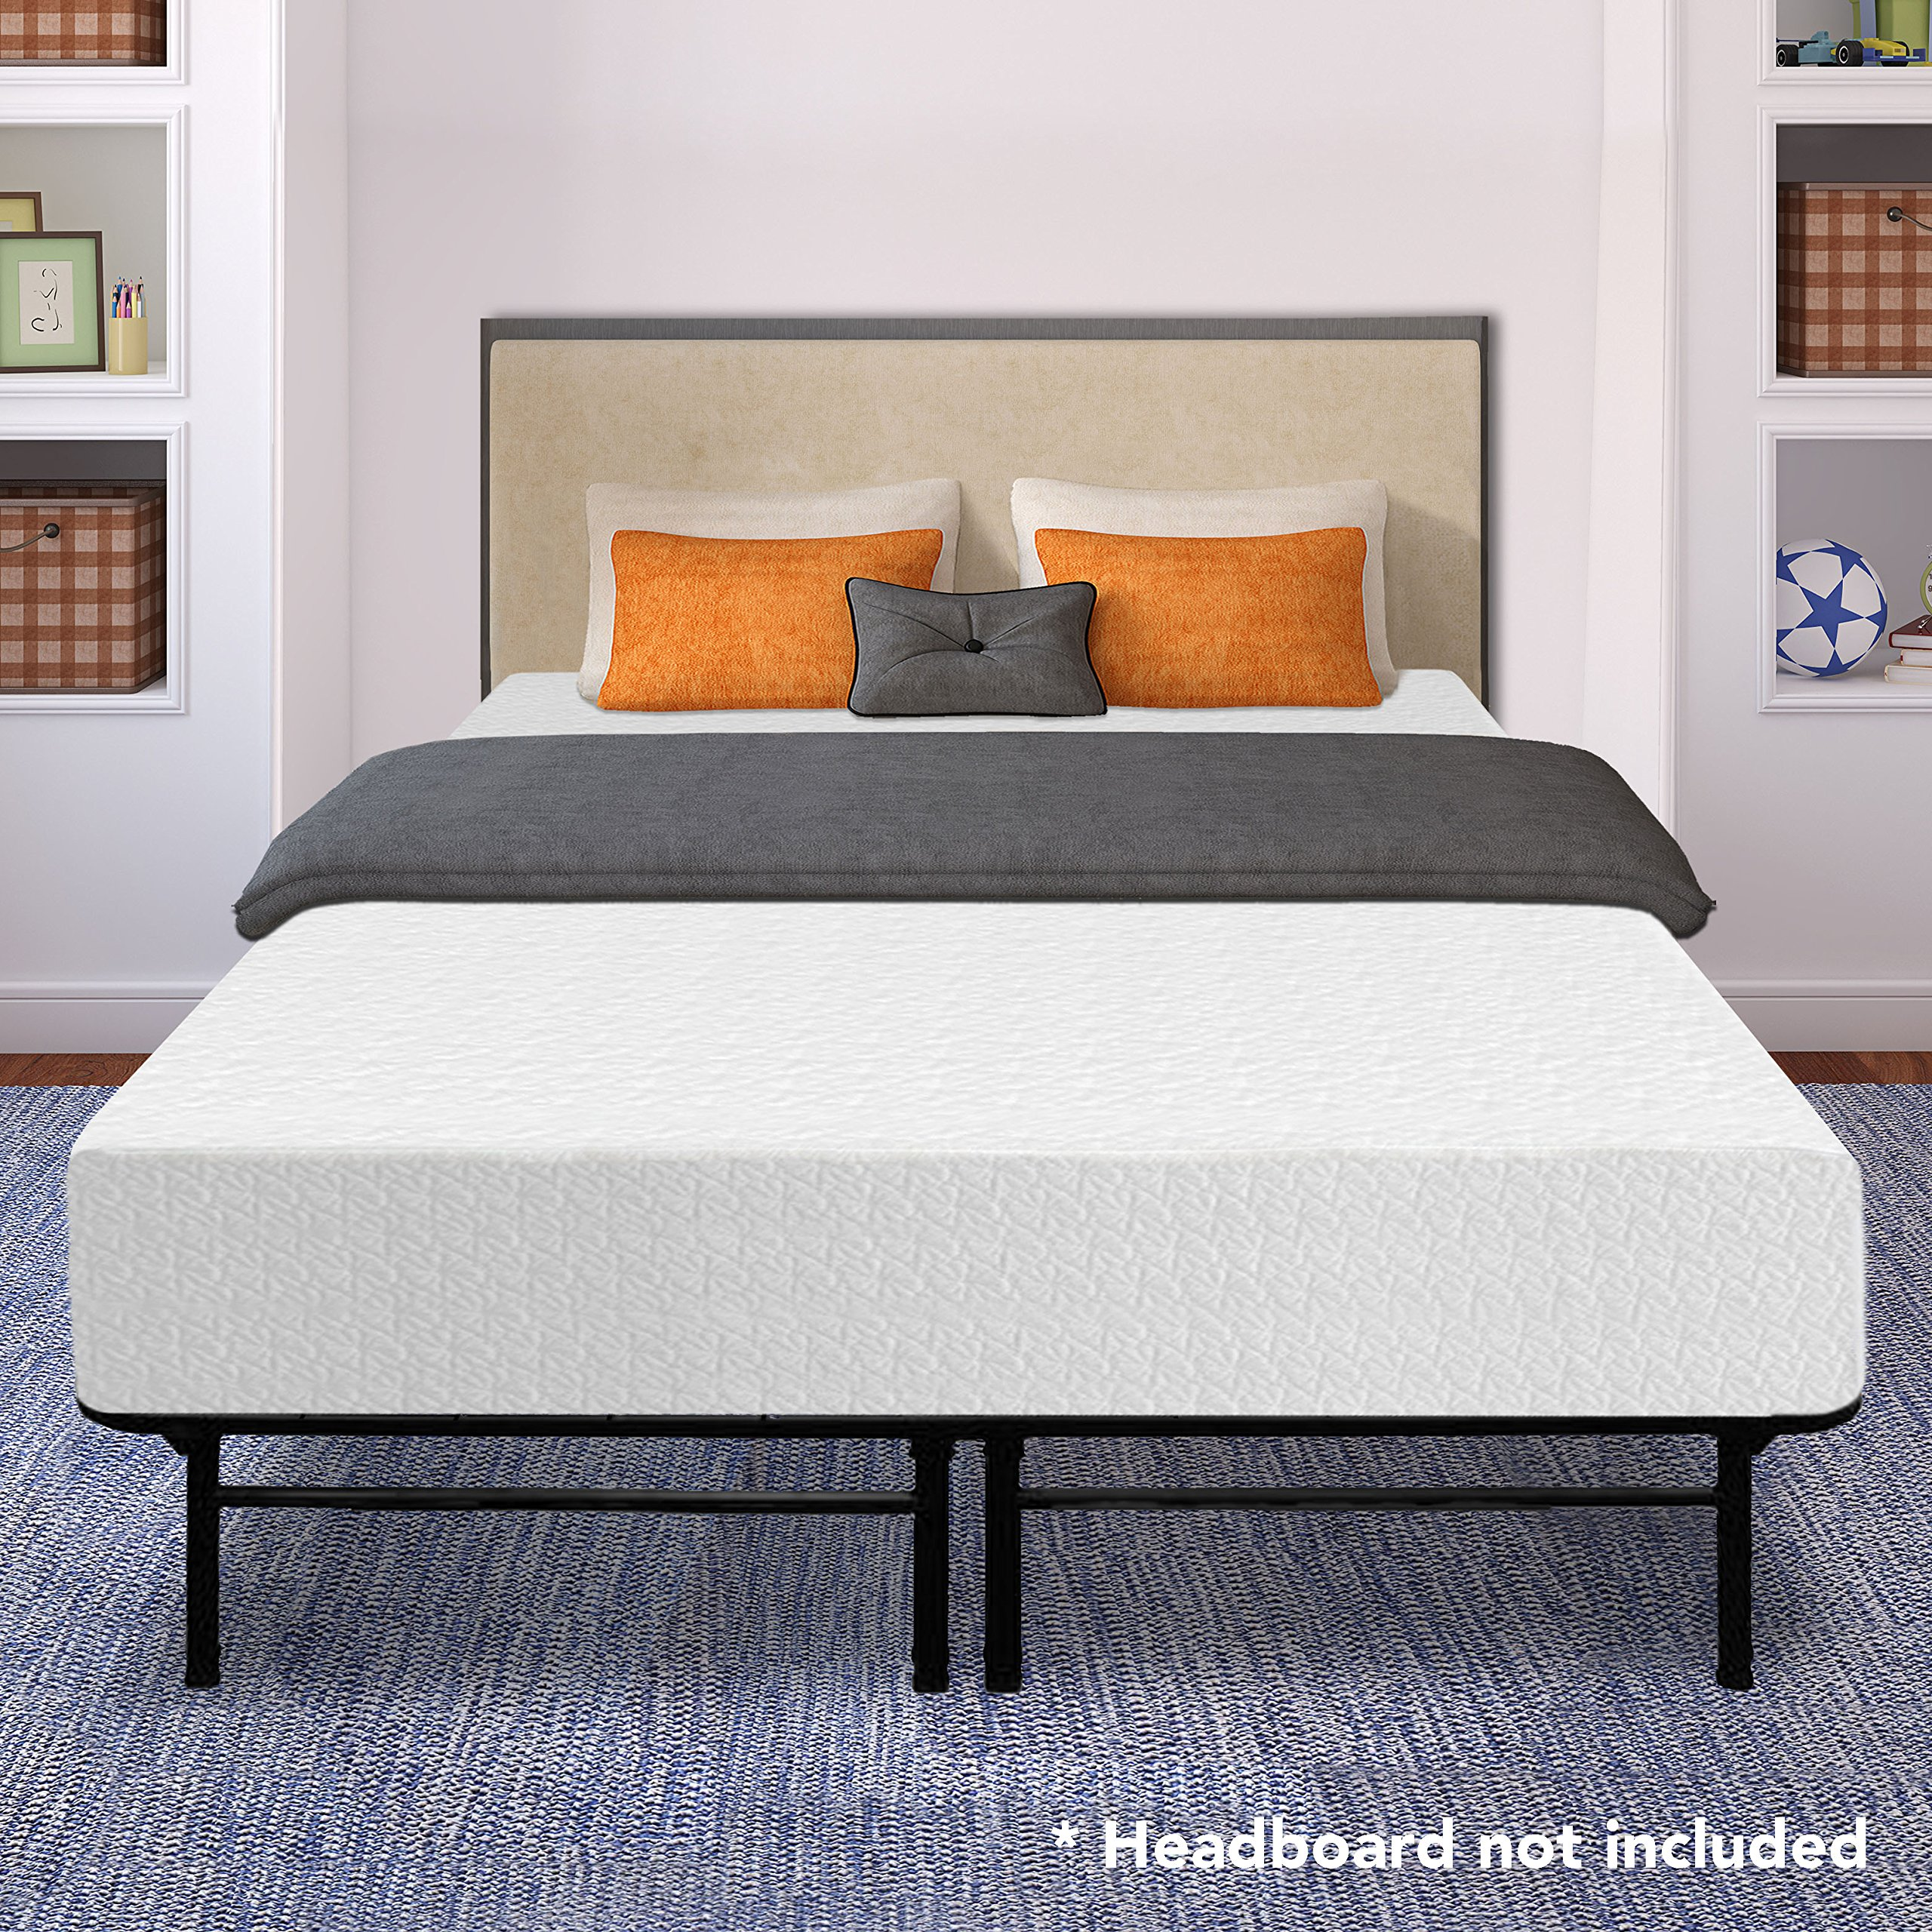 Best Price Mattress 12'' Memory Foam Mattress and 14'' Premium Steel Bed Frame/Foundation Set, California King